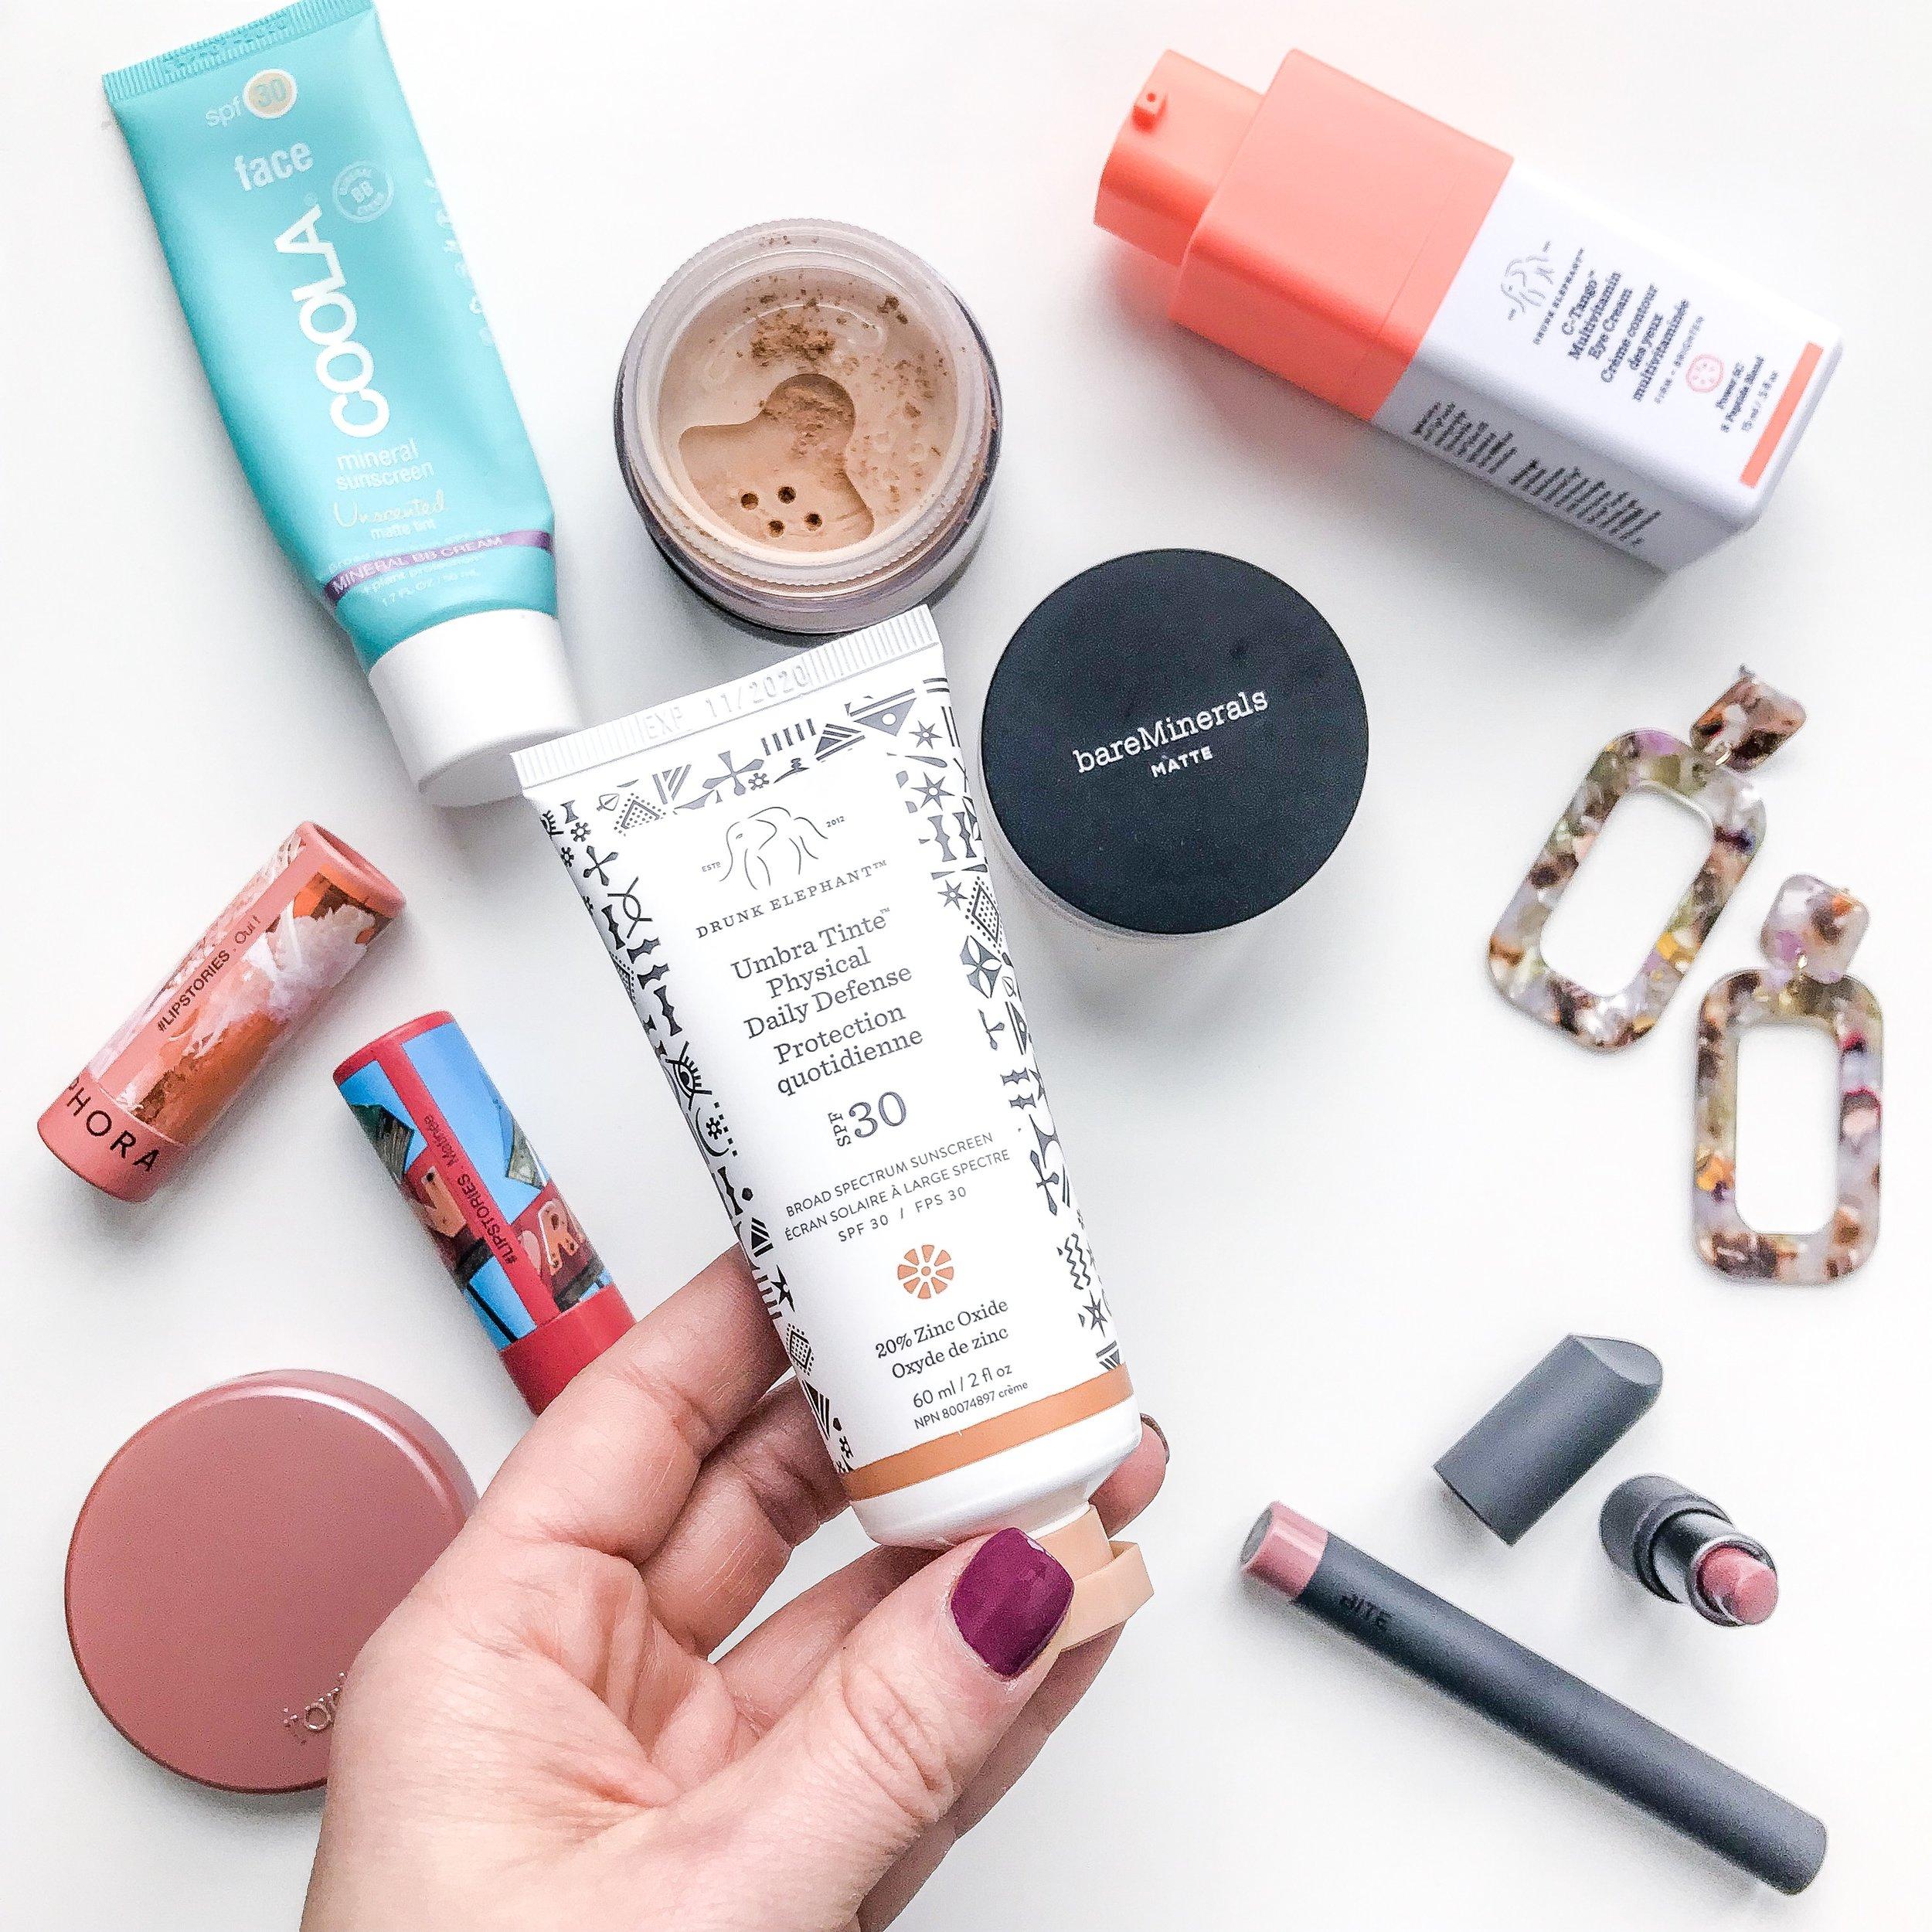 Sephora's Beauty Insider Spring Bonus -- The Life She Wanders